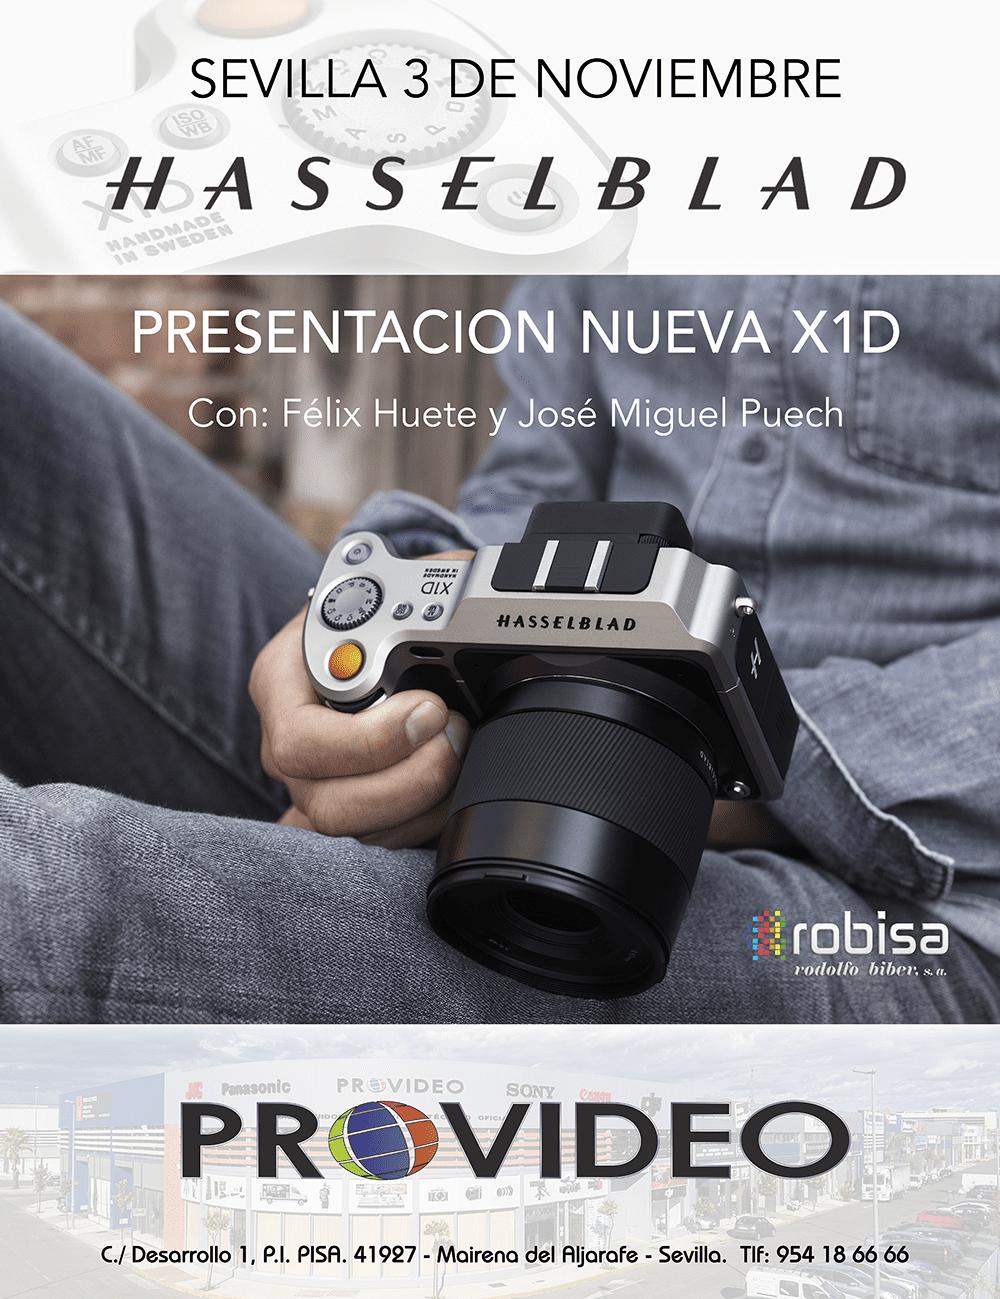 hasselblad_x1d_lifestyle_sitting_robisa2